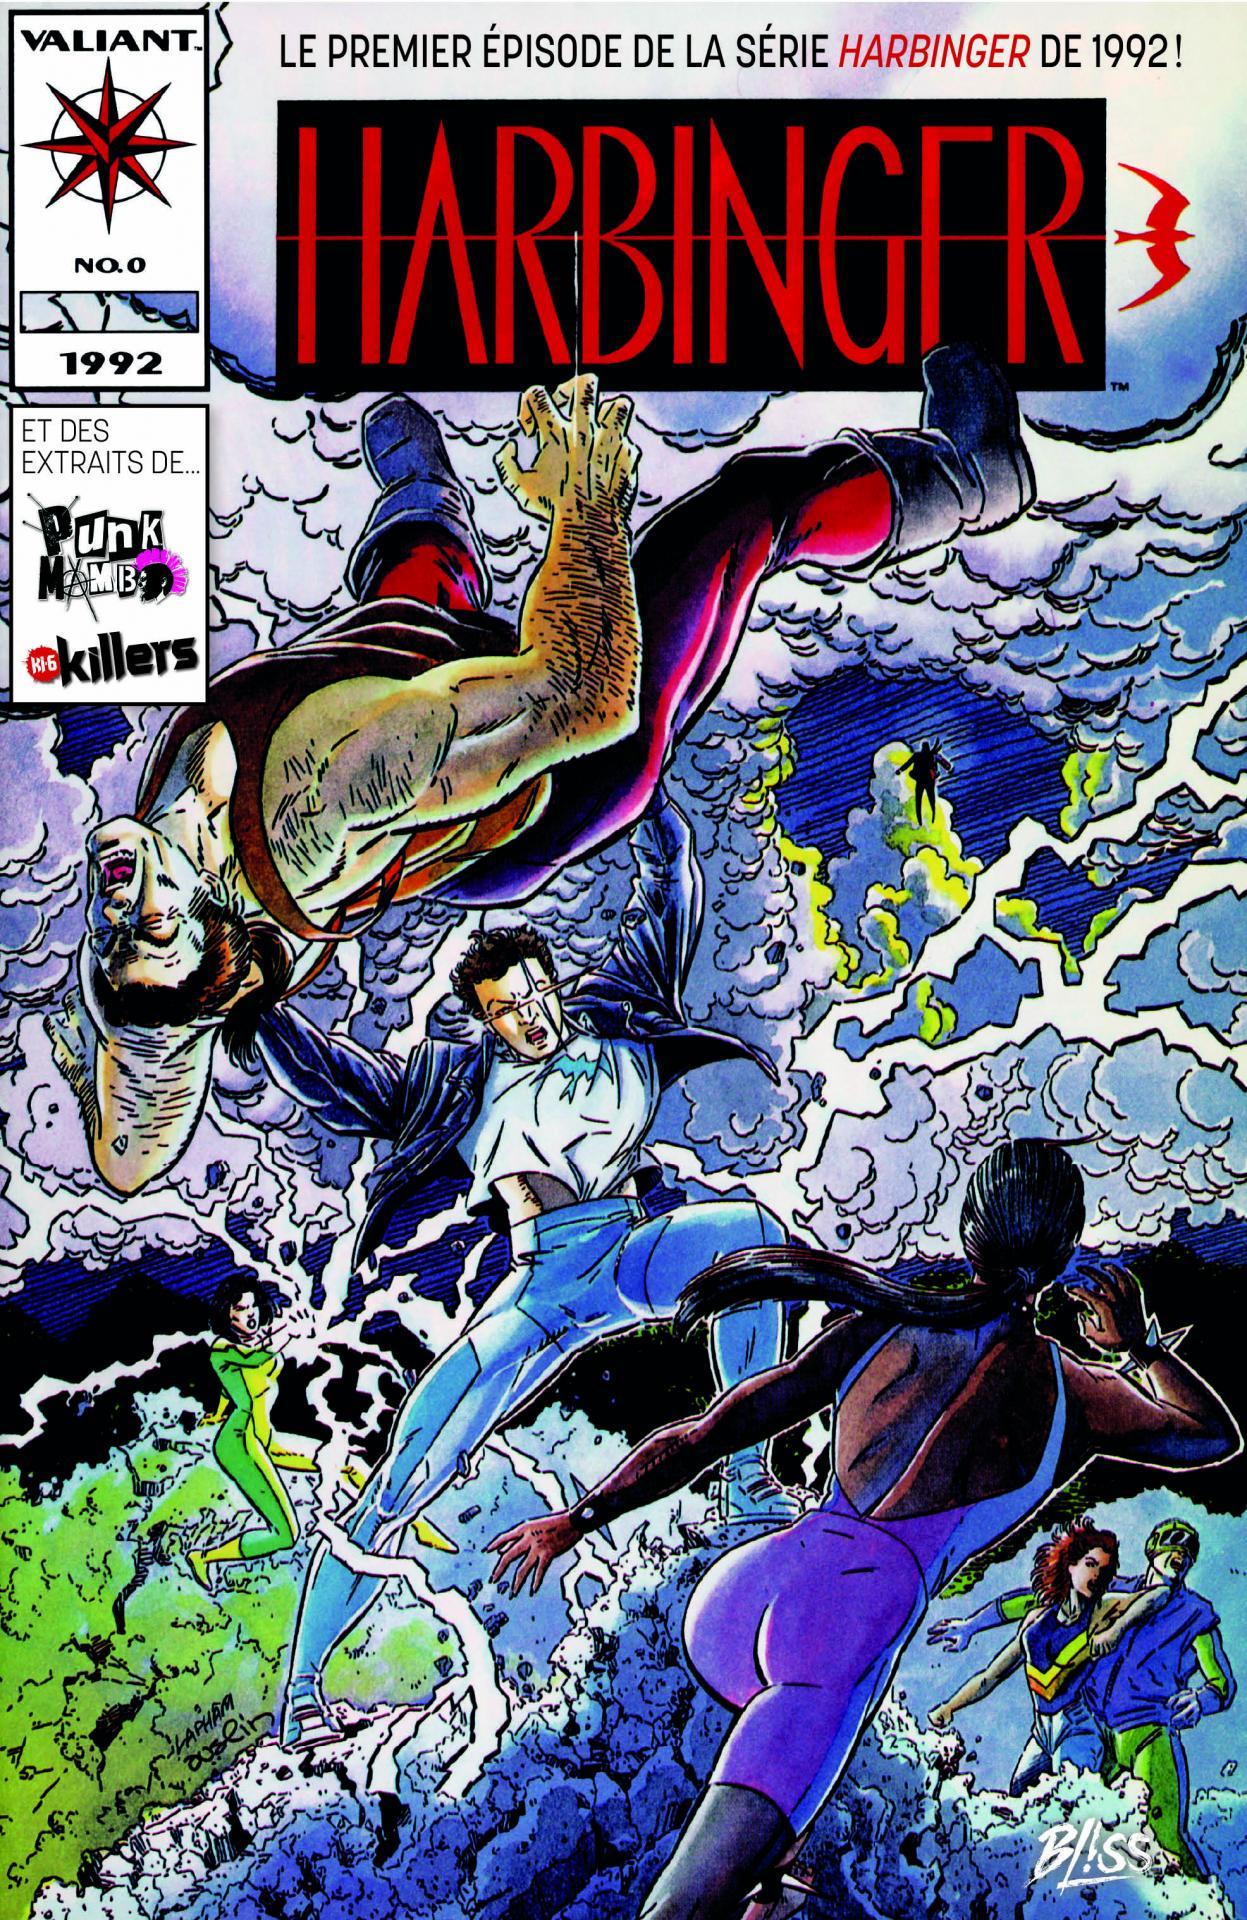 Bliss comics free comic book day france 2020 harbinger 1992